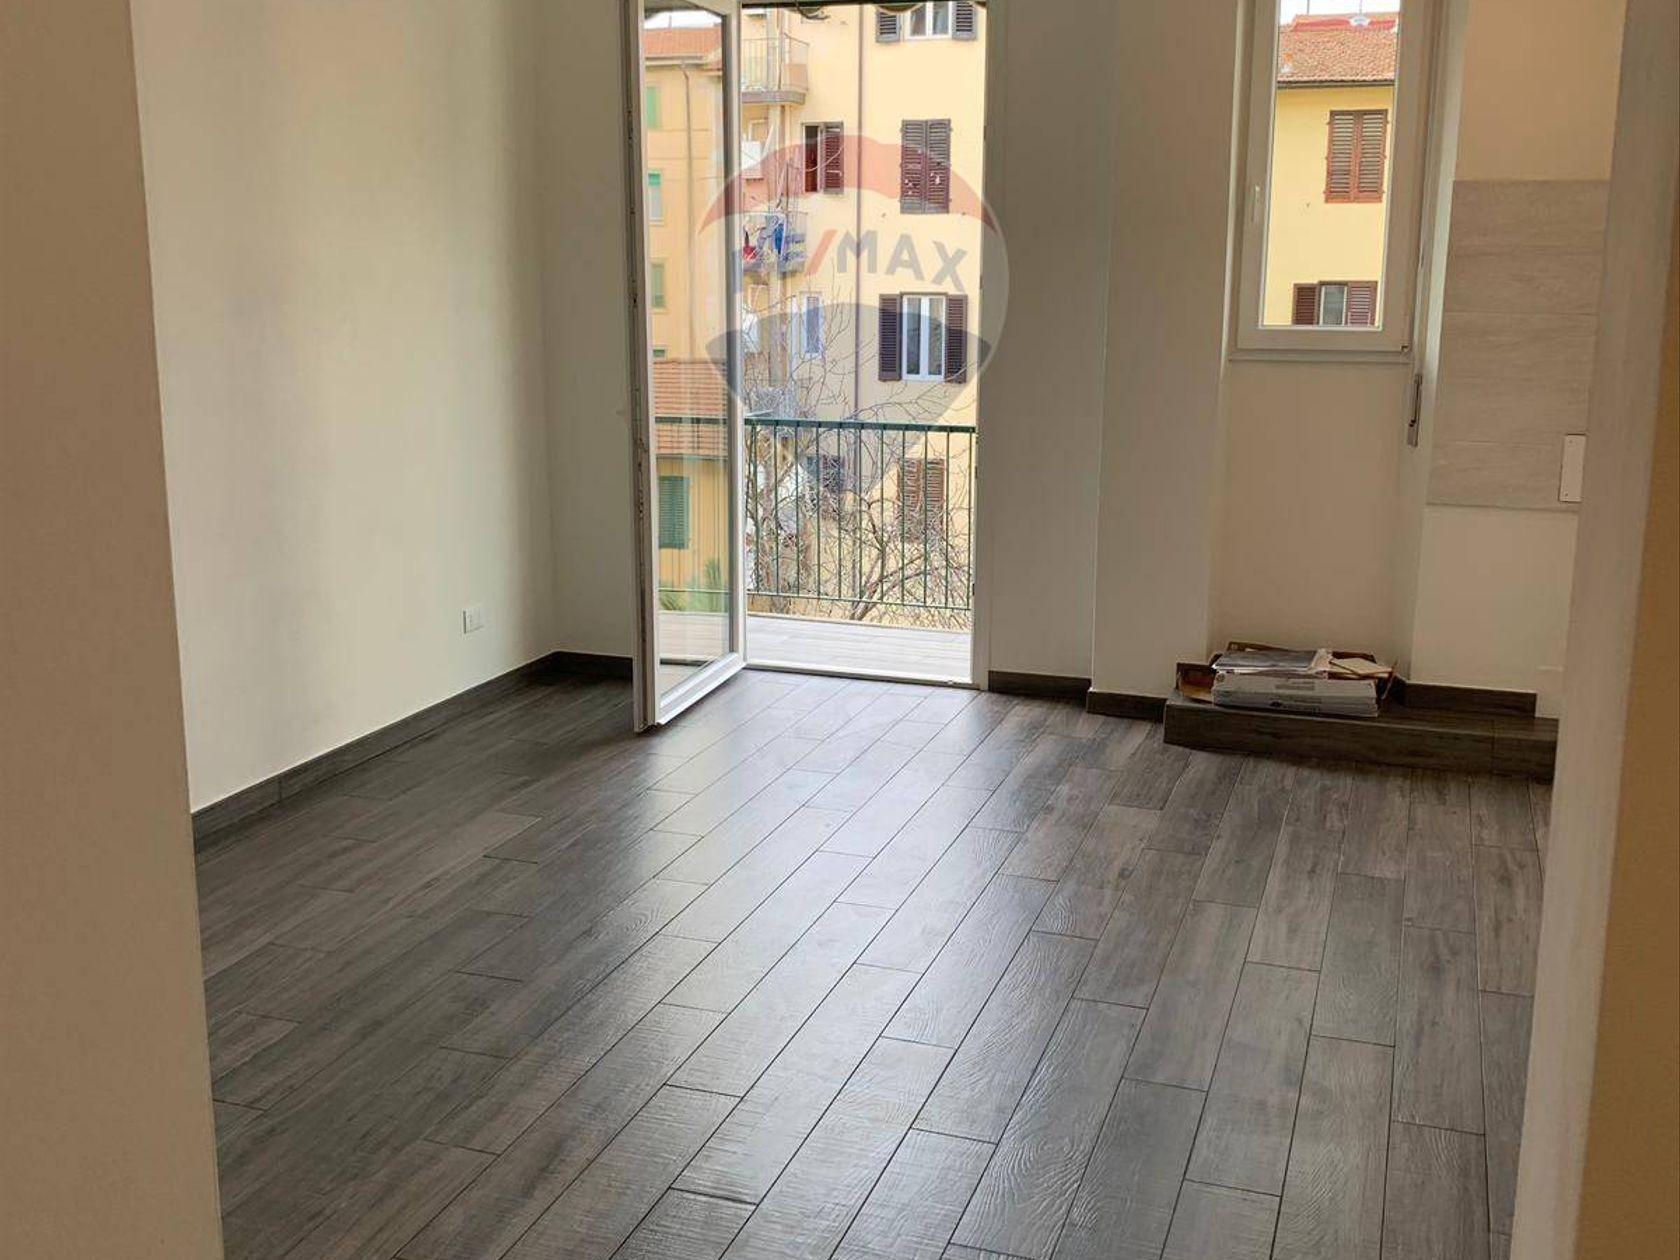 Appartamento San Iacopino, Firenze, FI Vendita - Foto 11